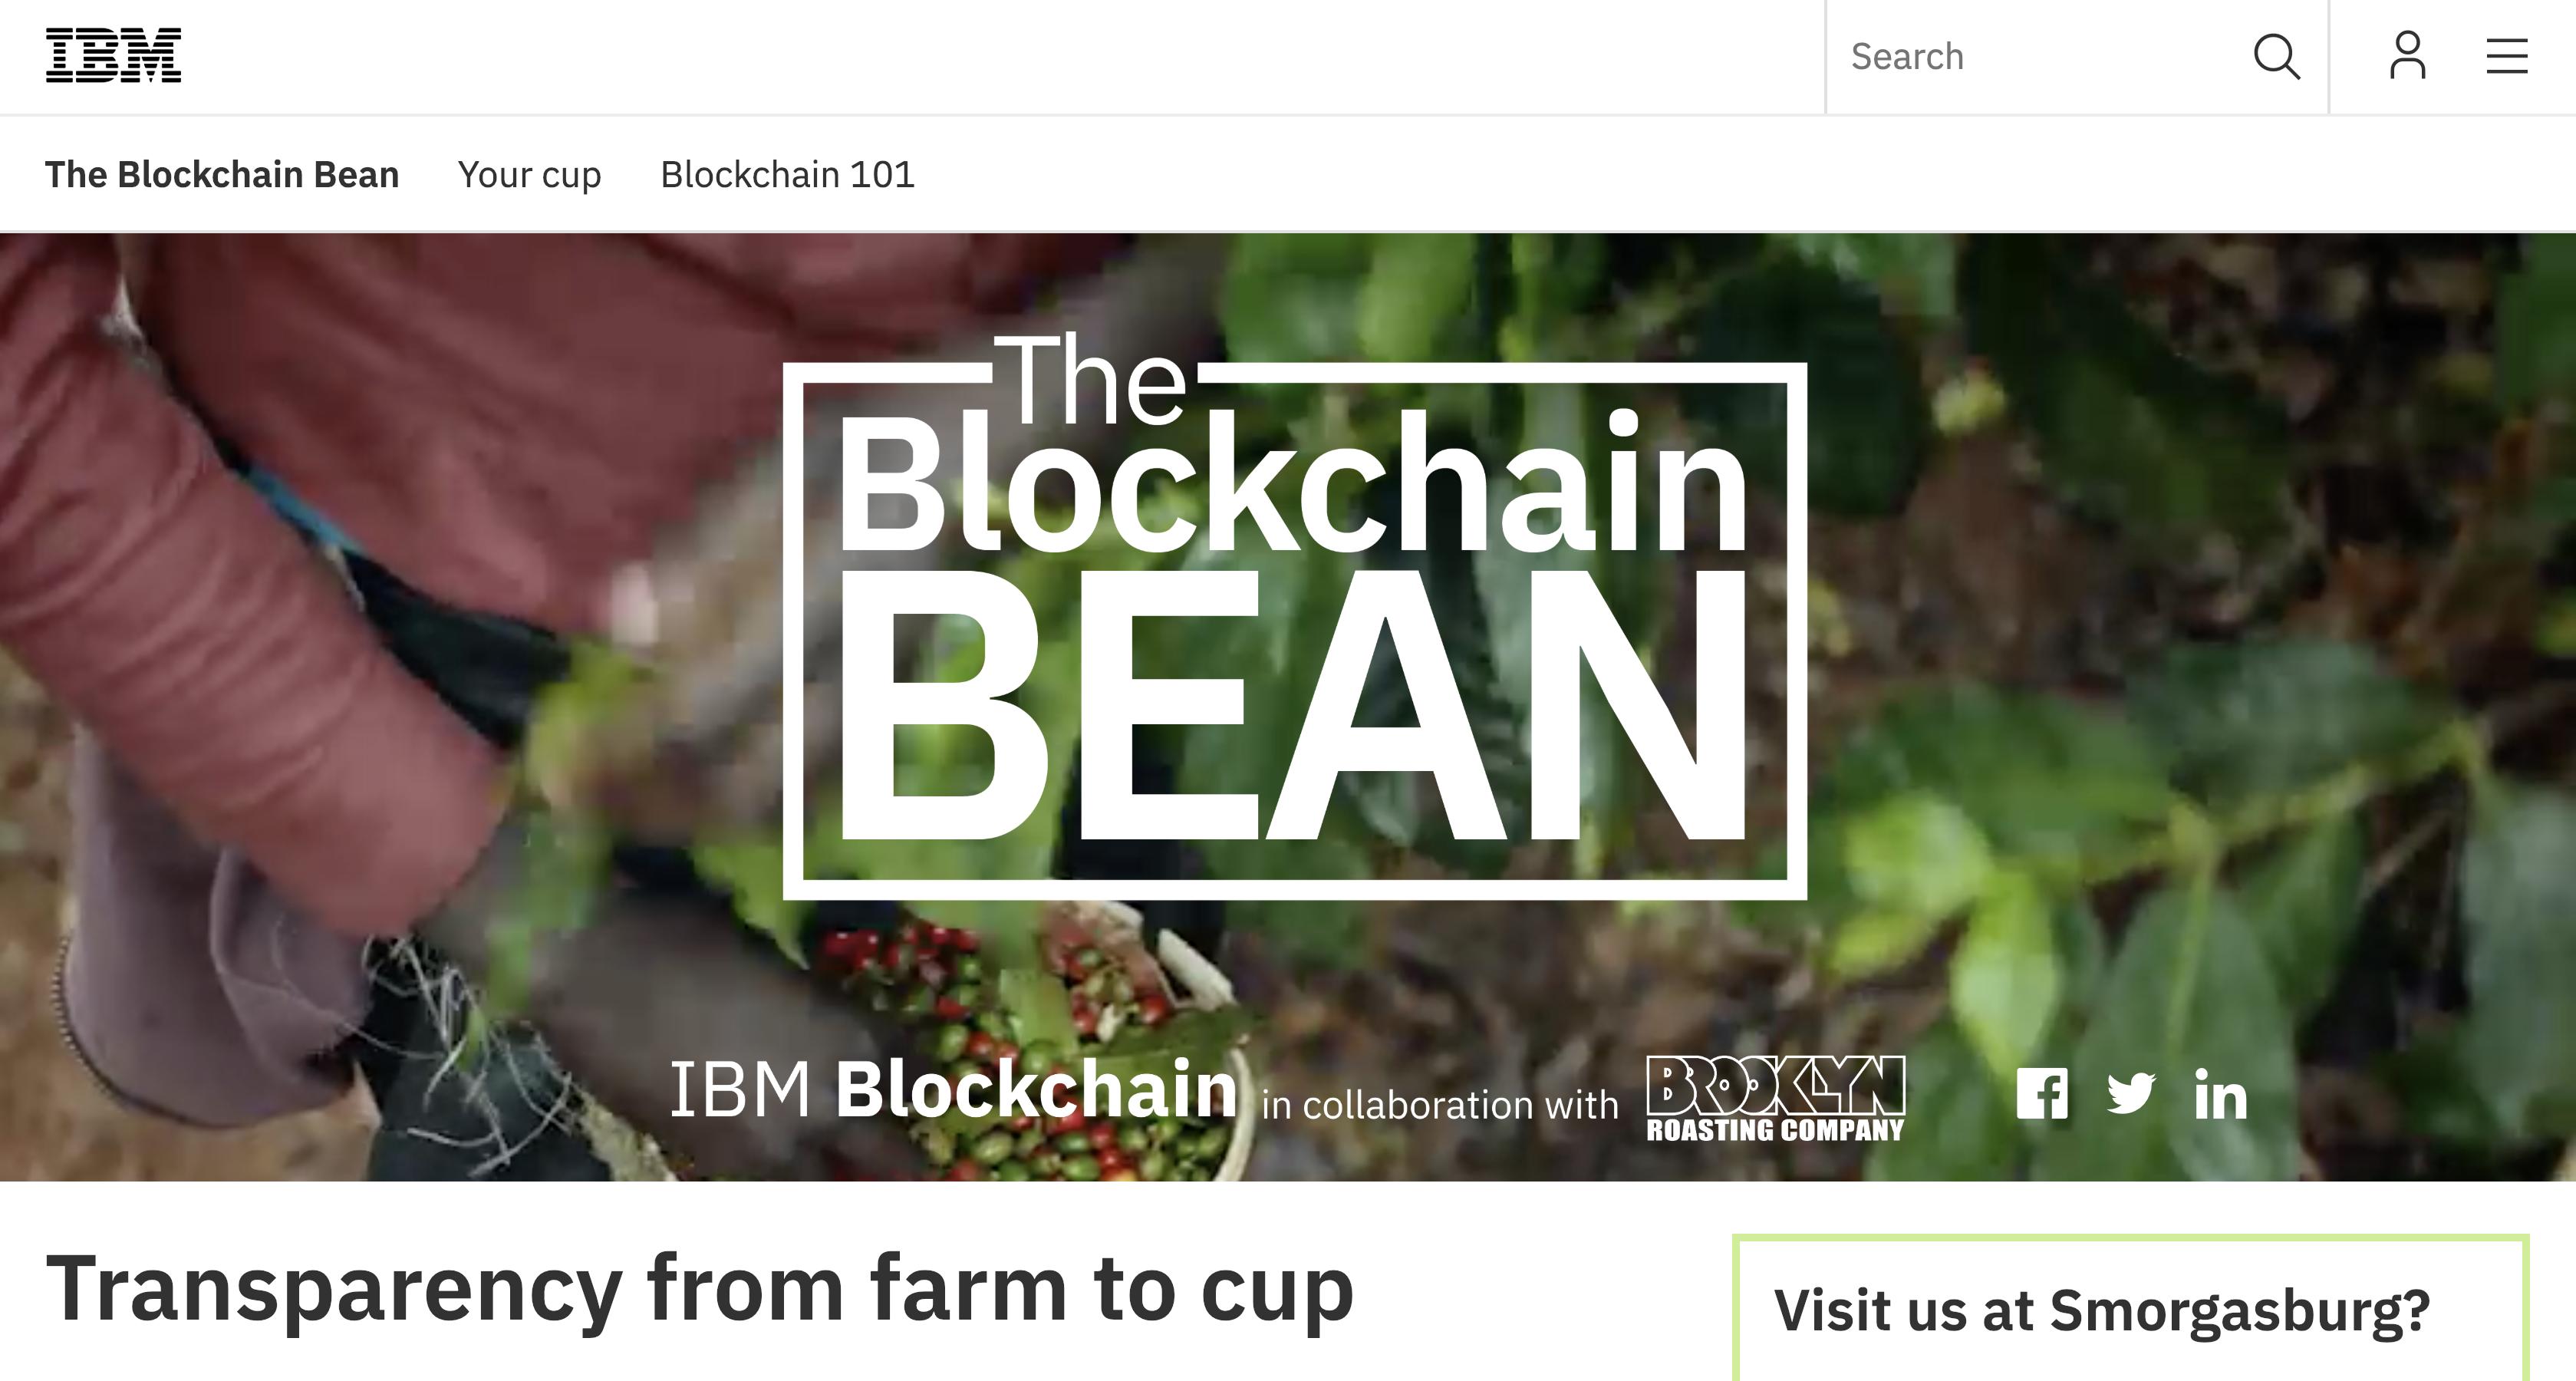 Blockchain Bean: A blockchain network based on the coffee supply chain.